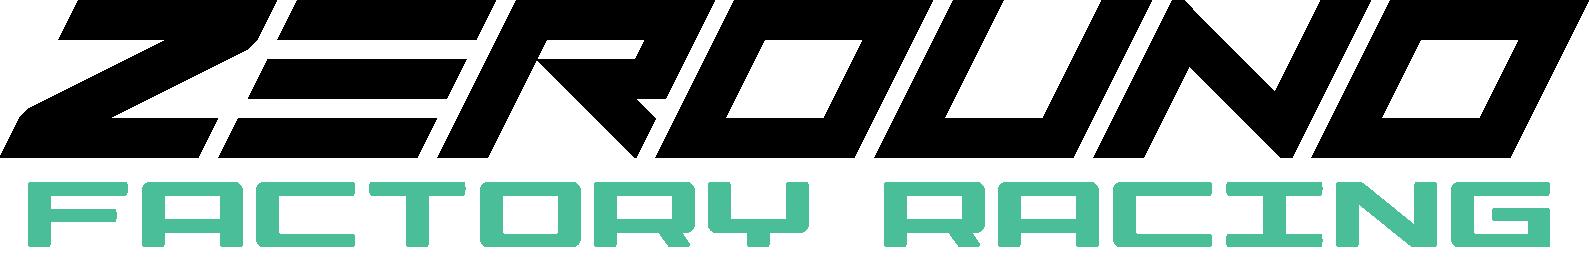 ZFR logo.png